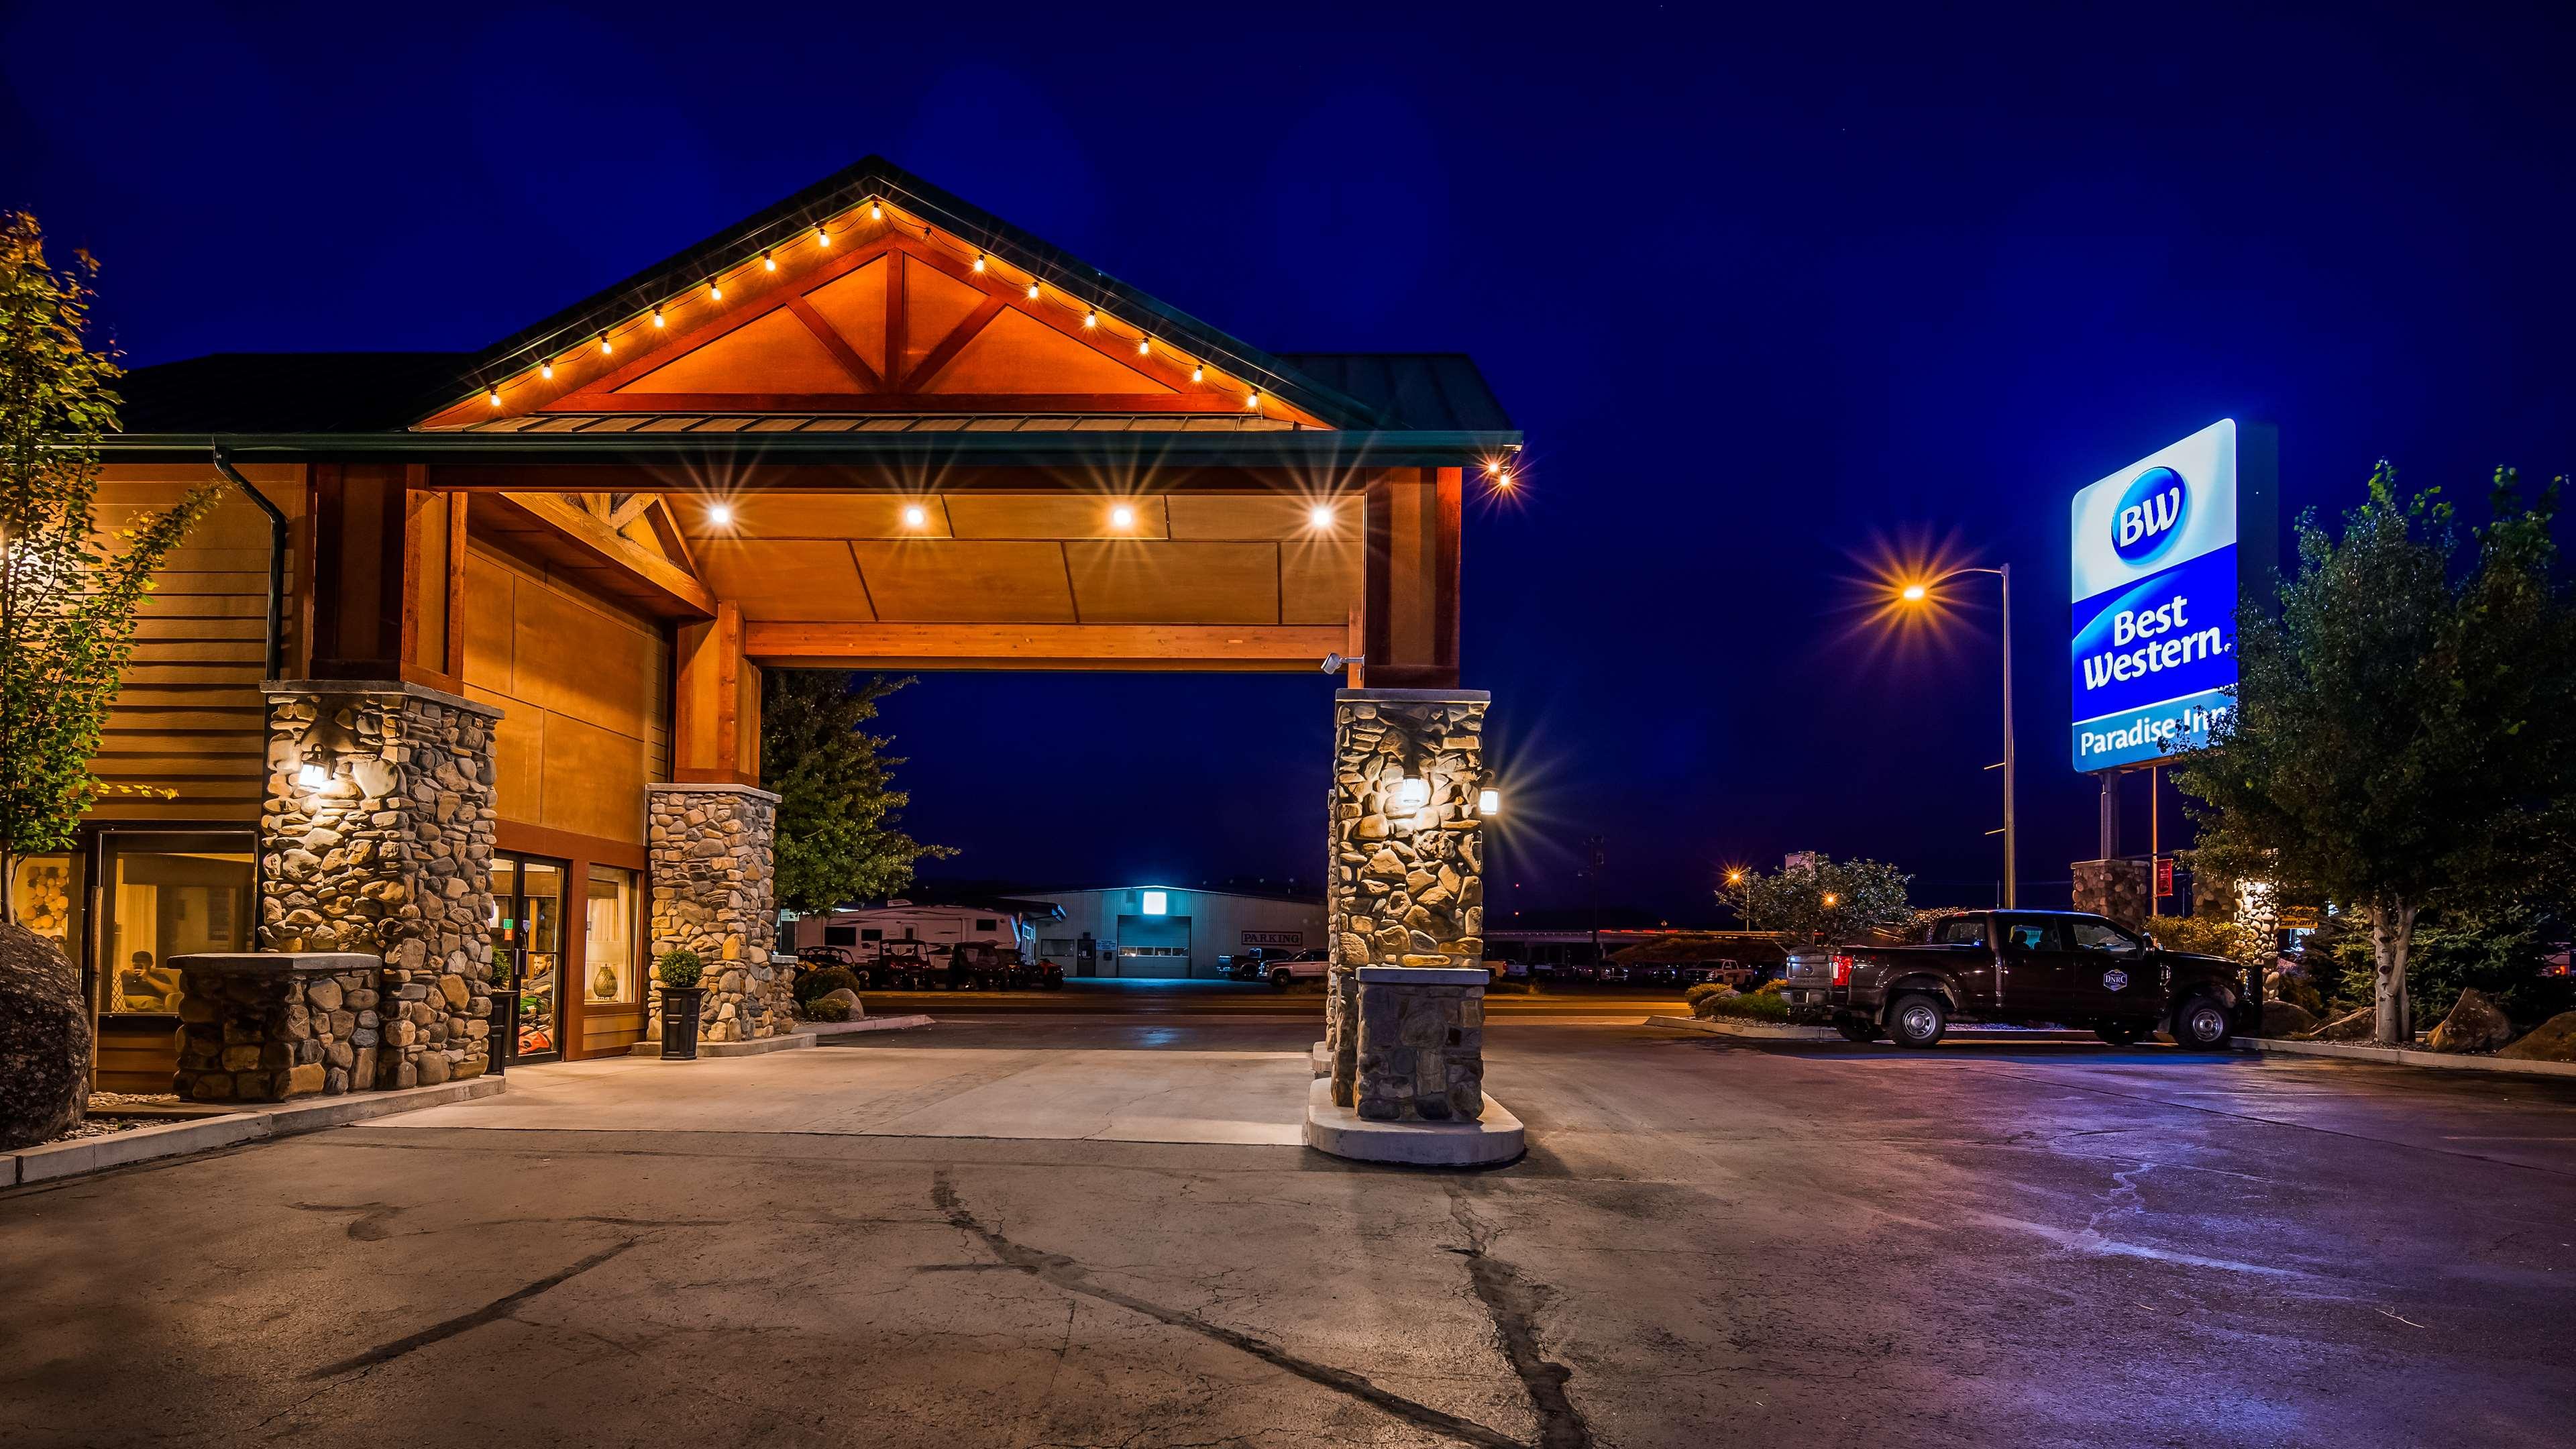 Best Western Paradise Inn image 1